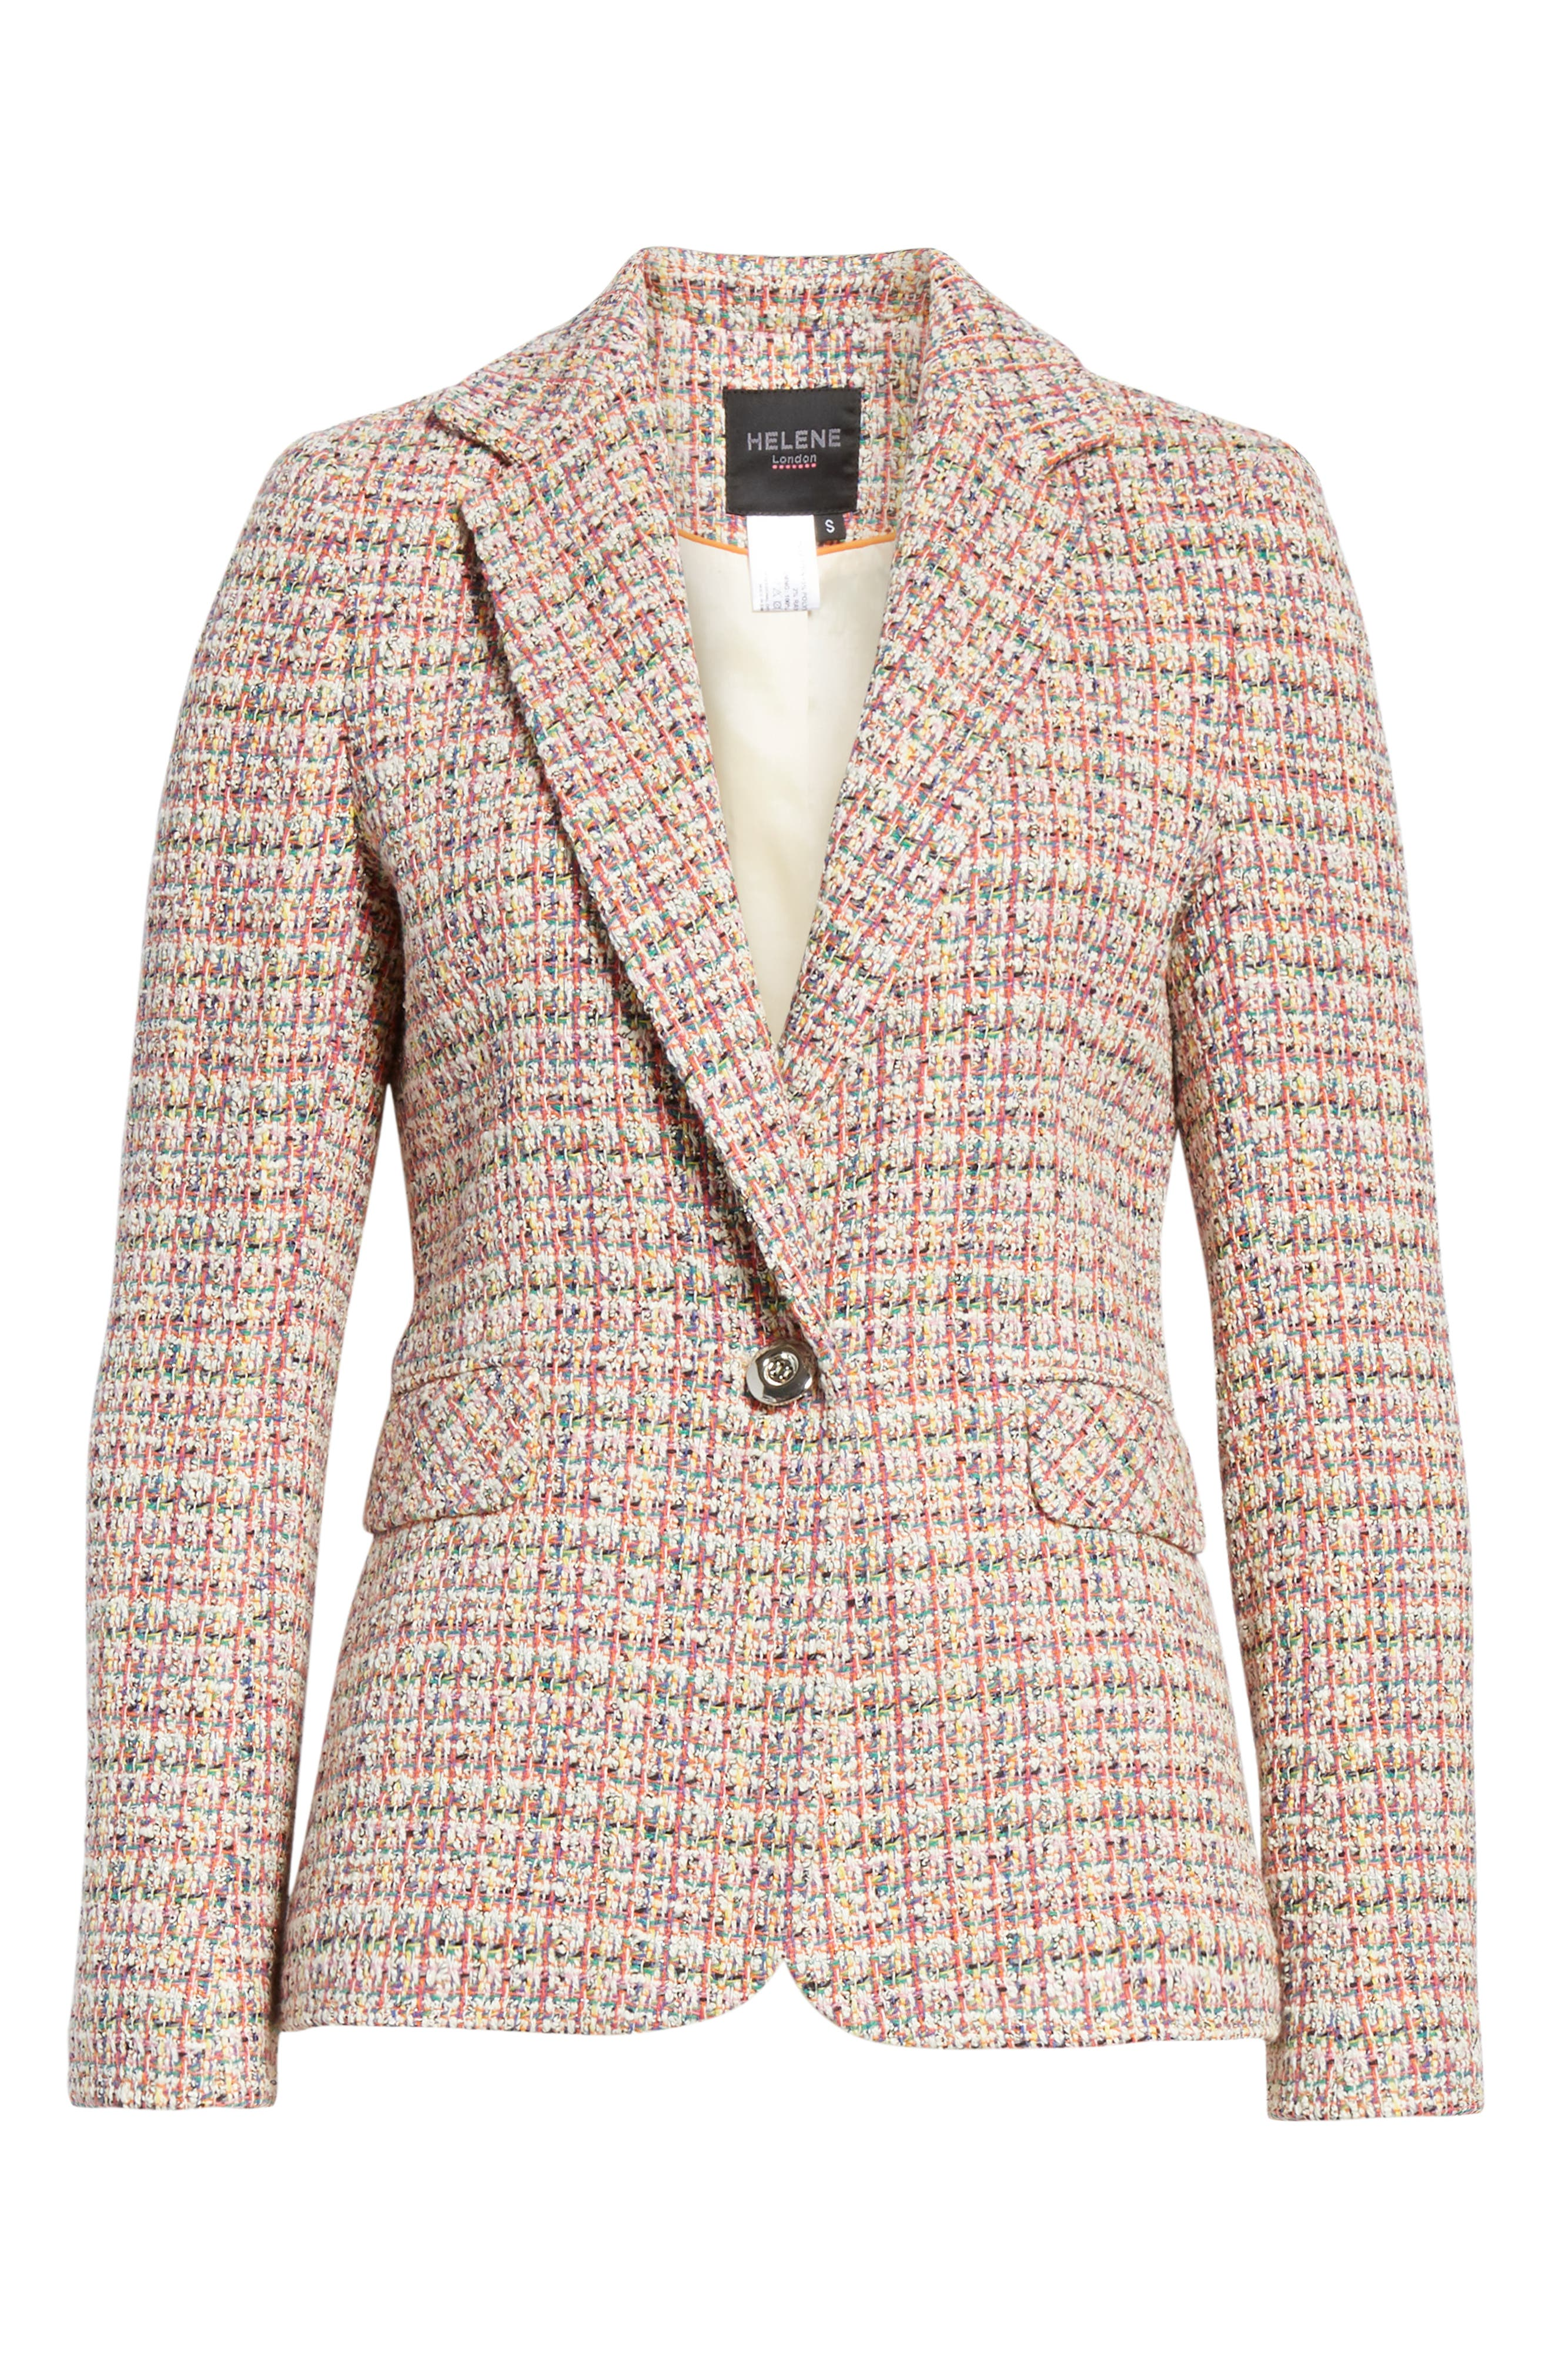 HELENE BERMAN, Colorful Tweed Blazer, Alternate thumbnail 5, color, ORANGE